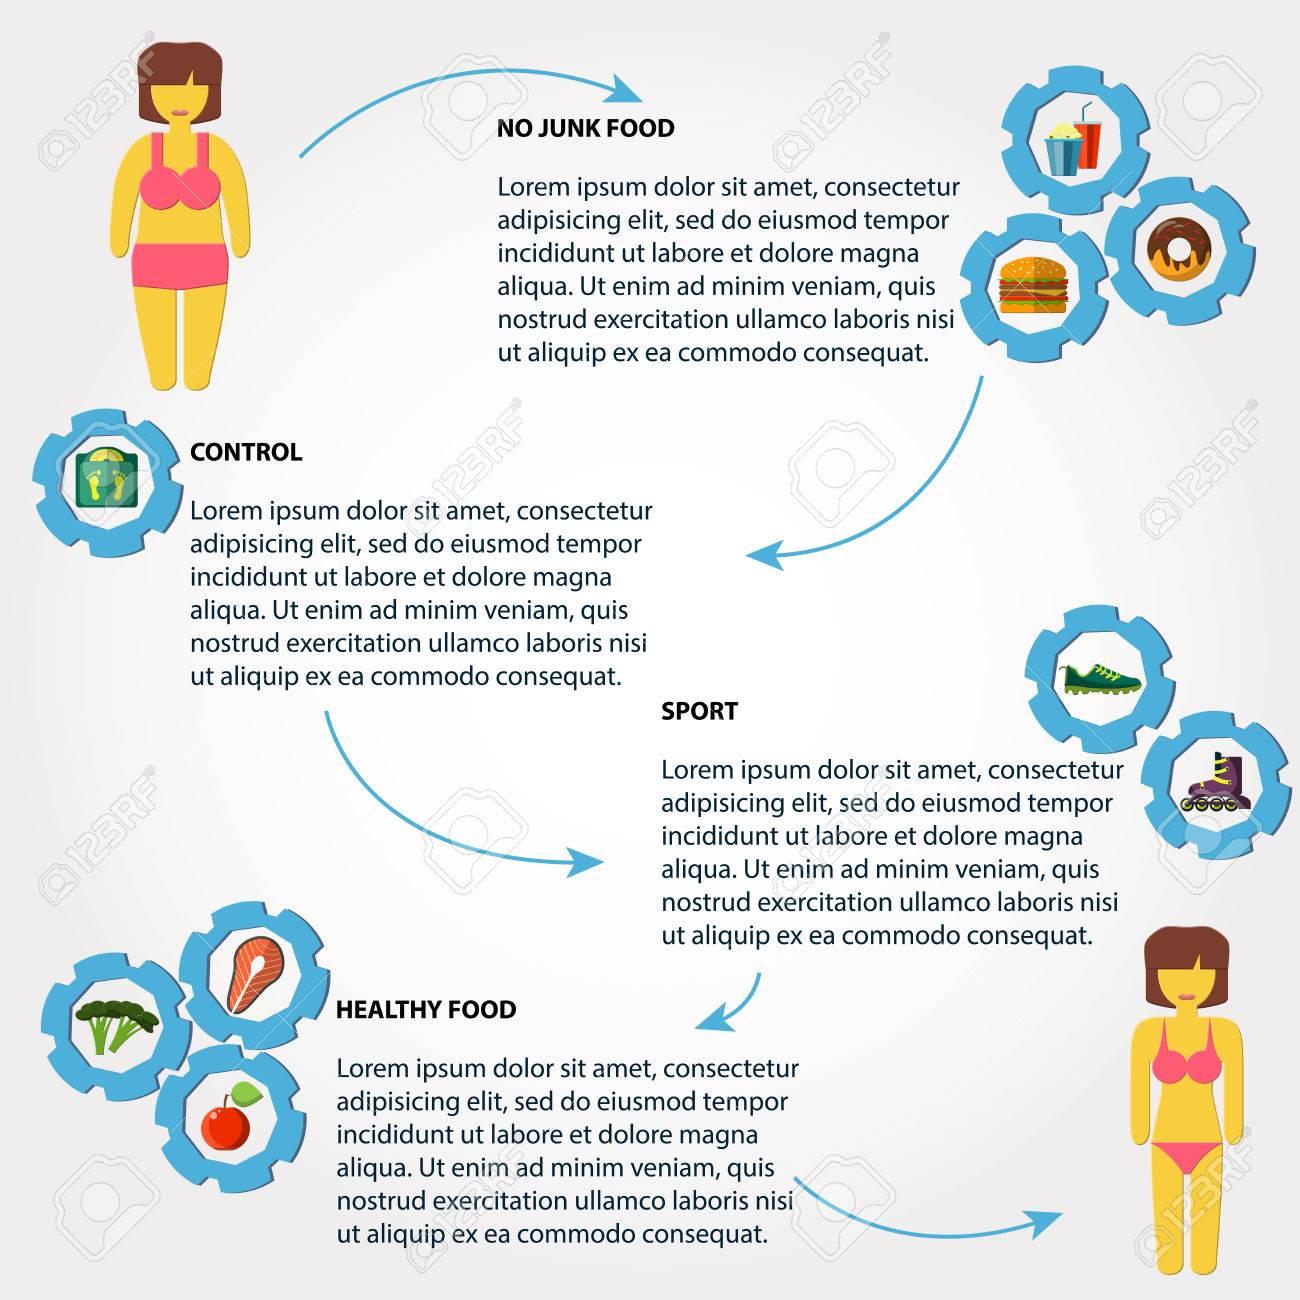 Flat Vector Illustration Of Weight Loss Programm Concept Design